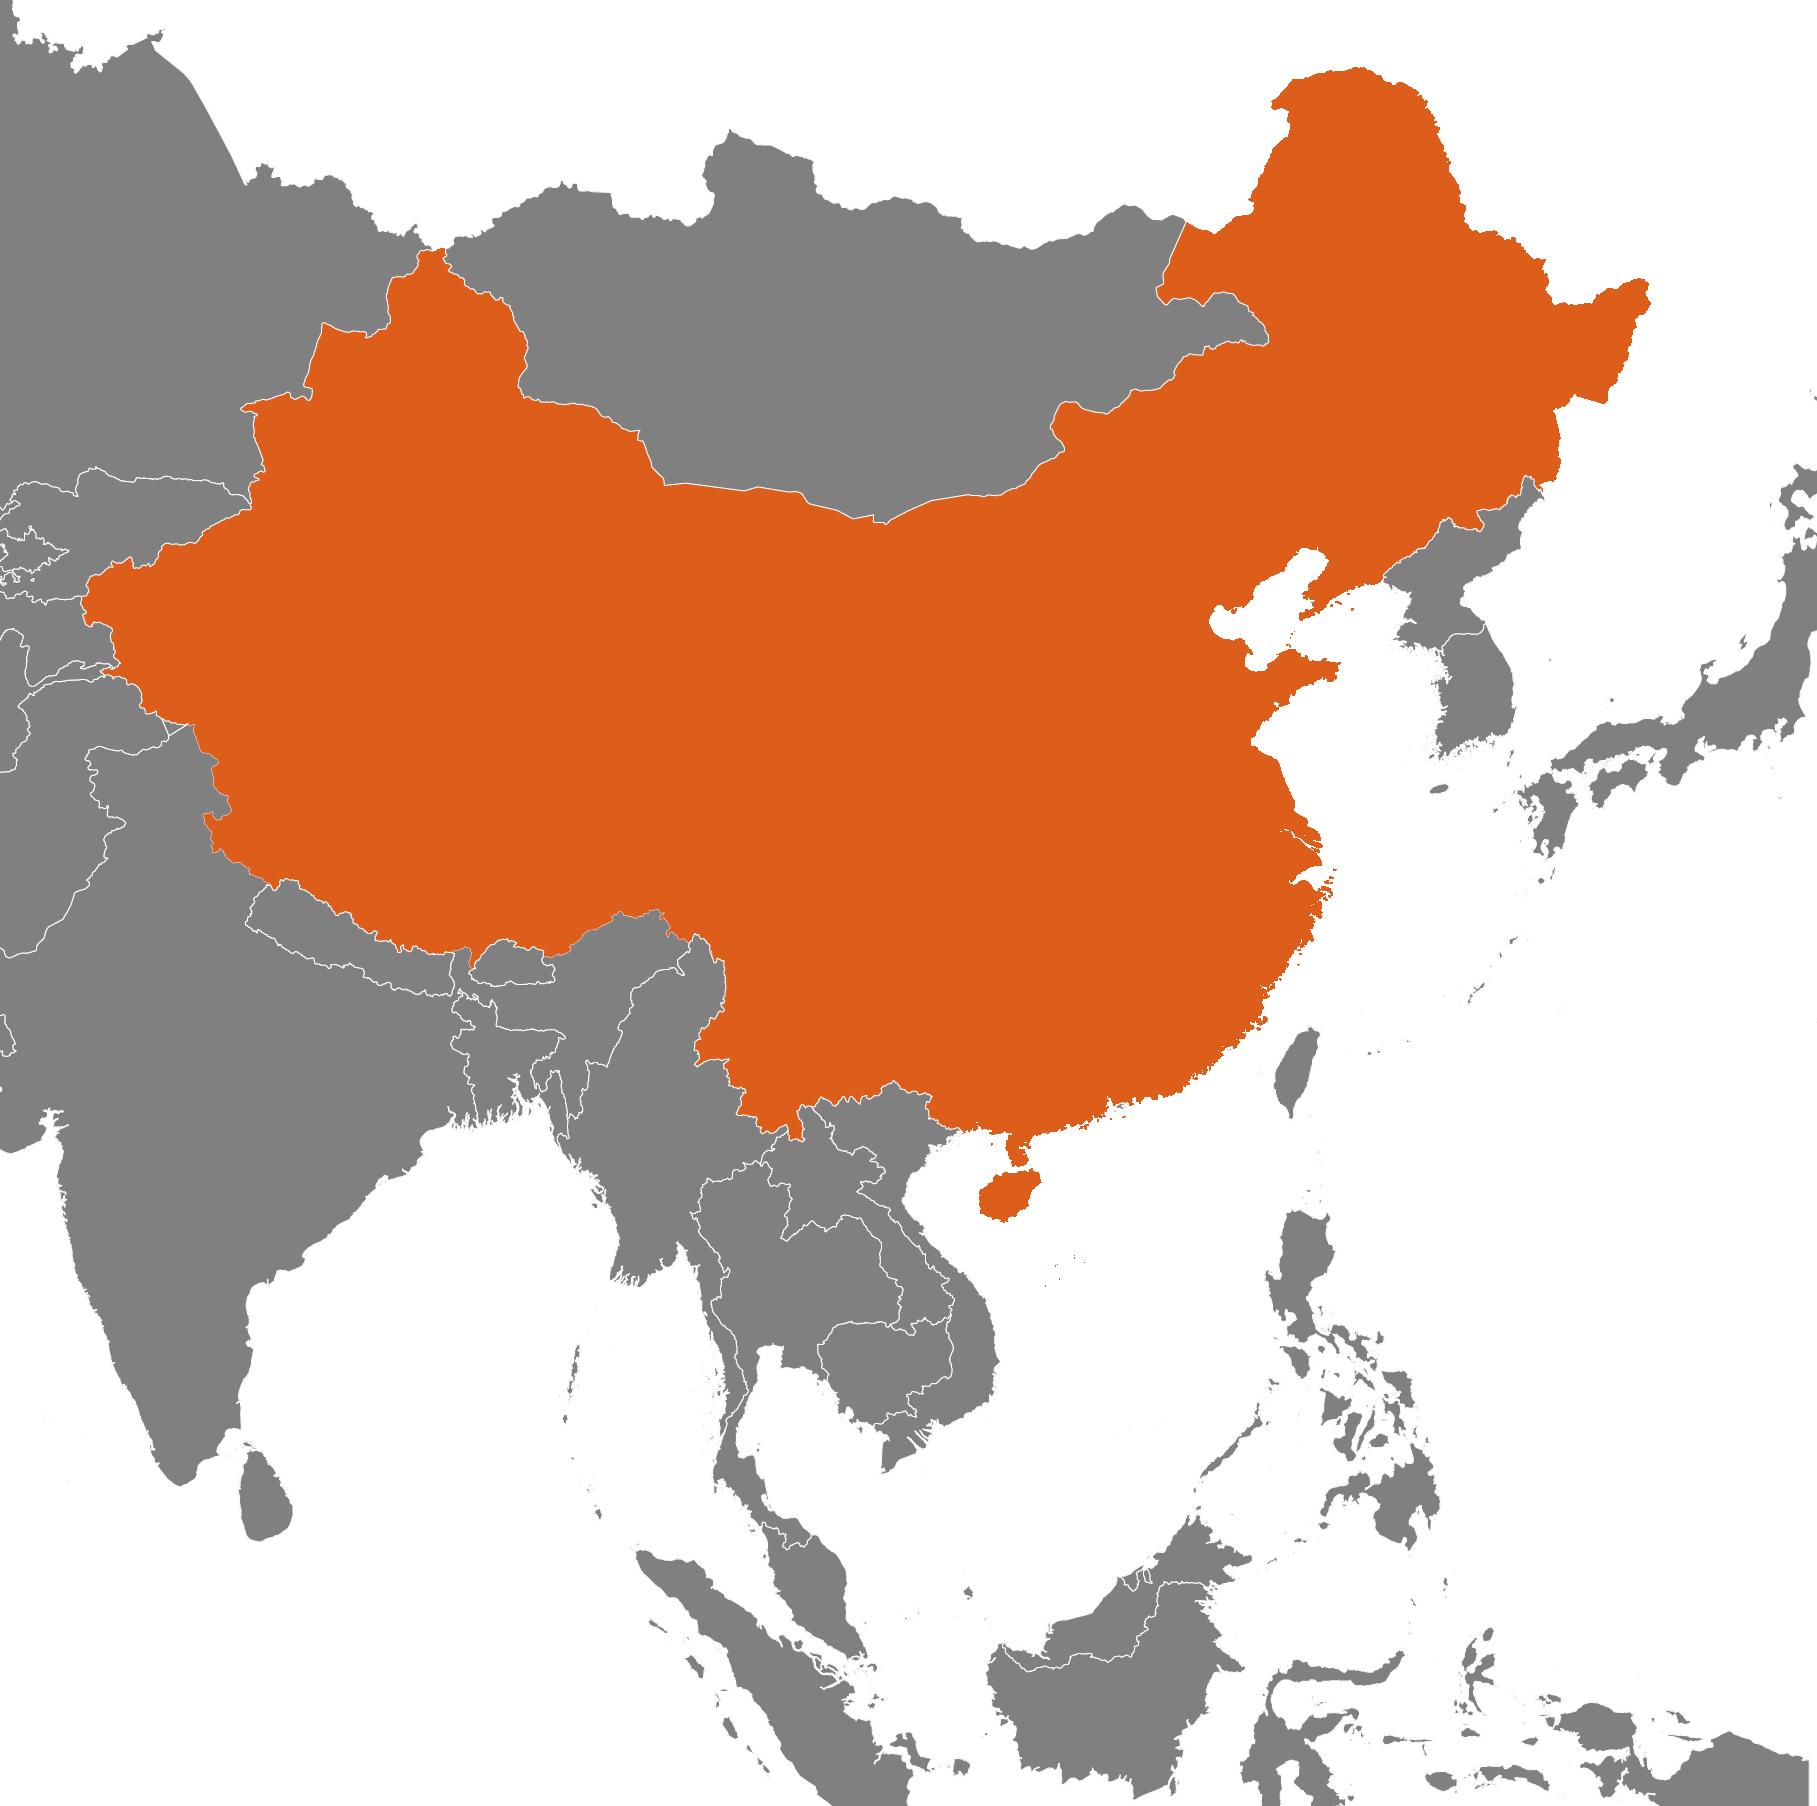 Kina på kartan